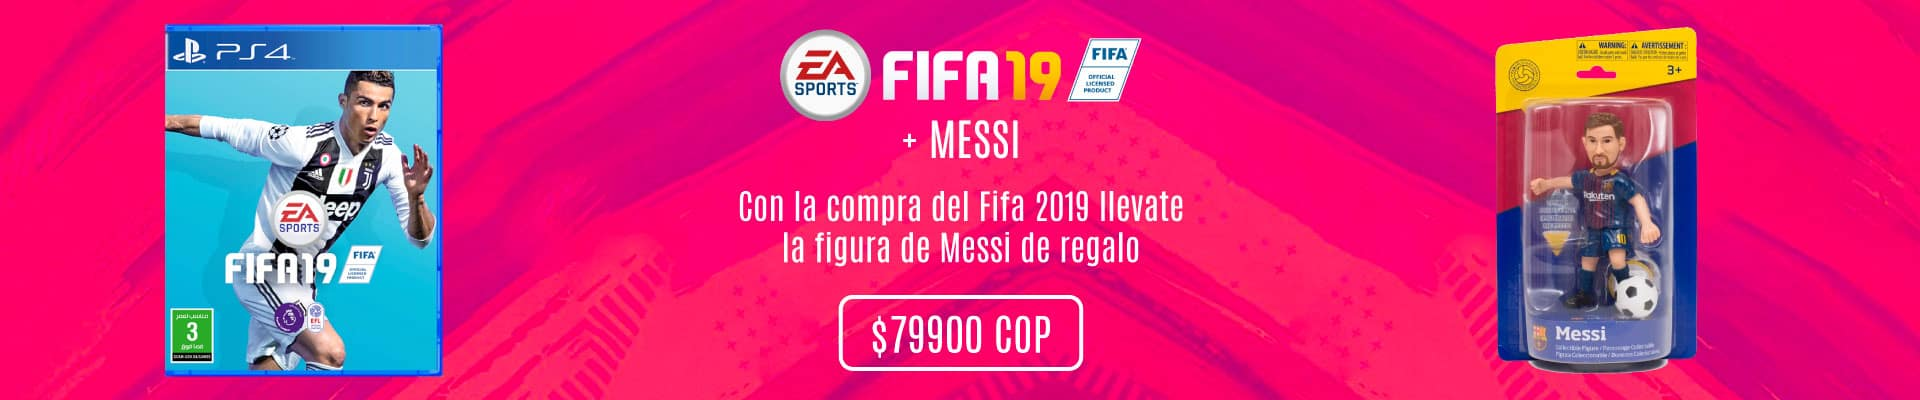 Promo Fifa 19 en Xtreme Play Colombia